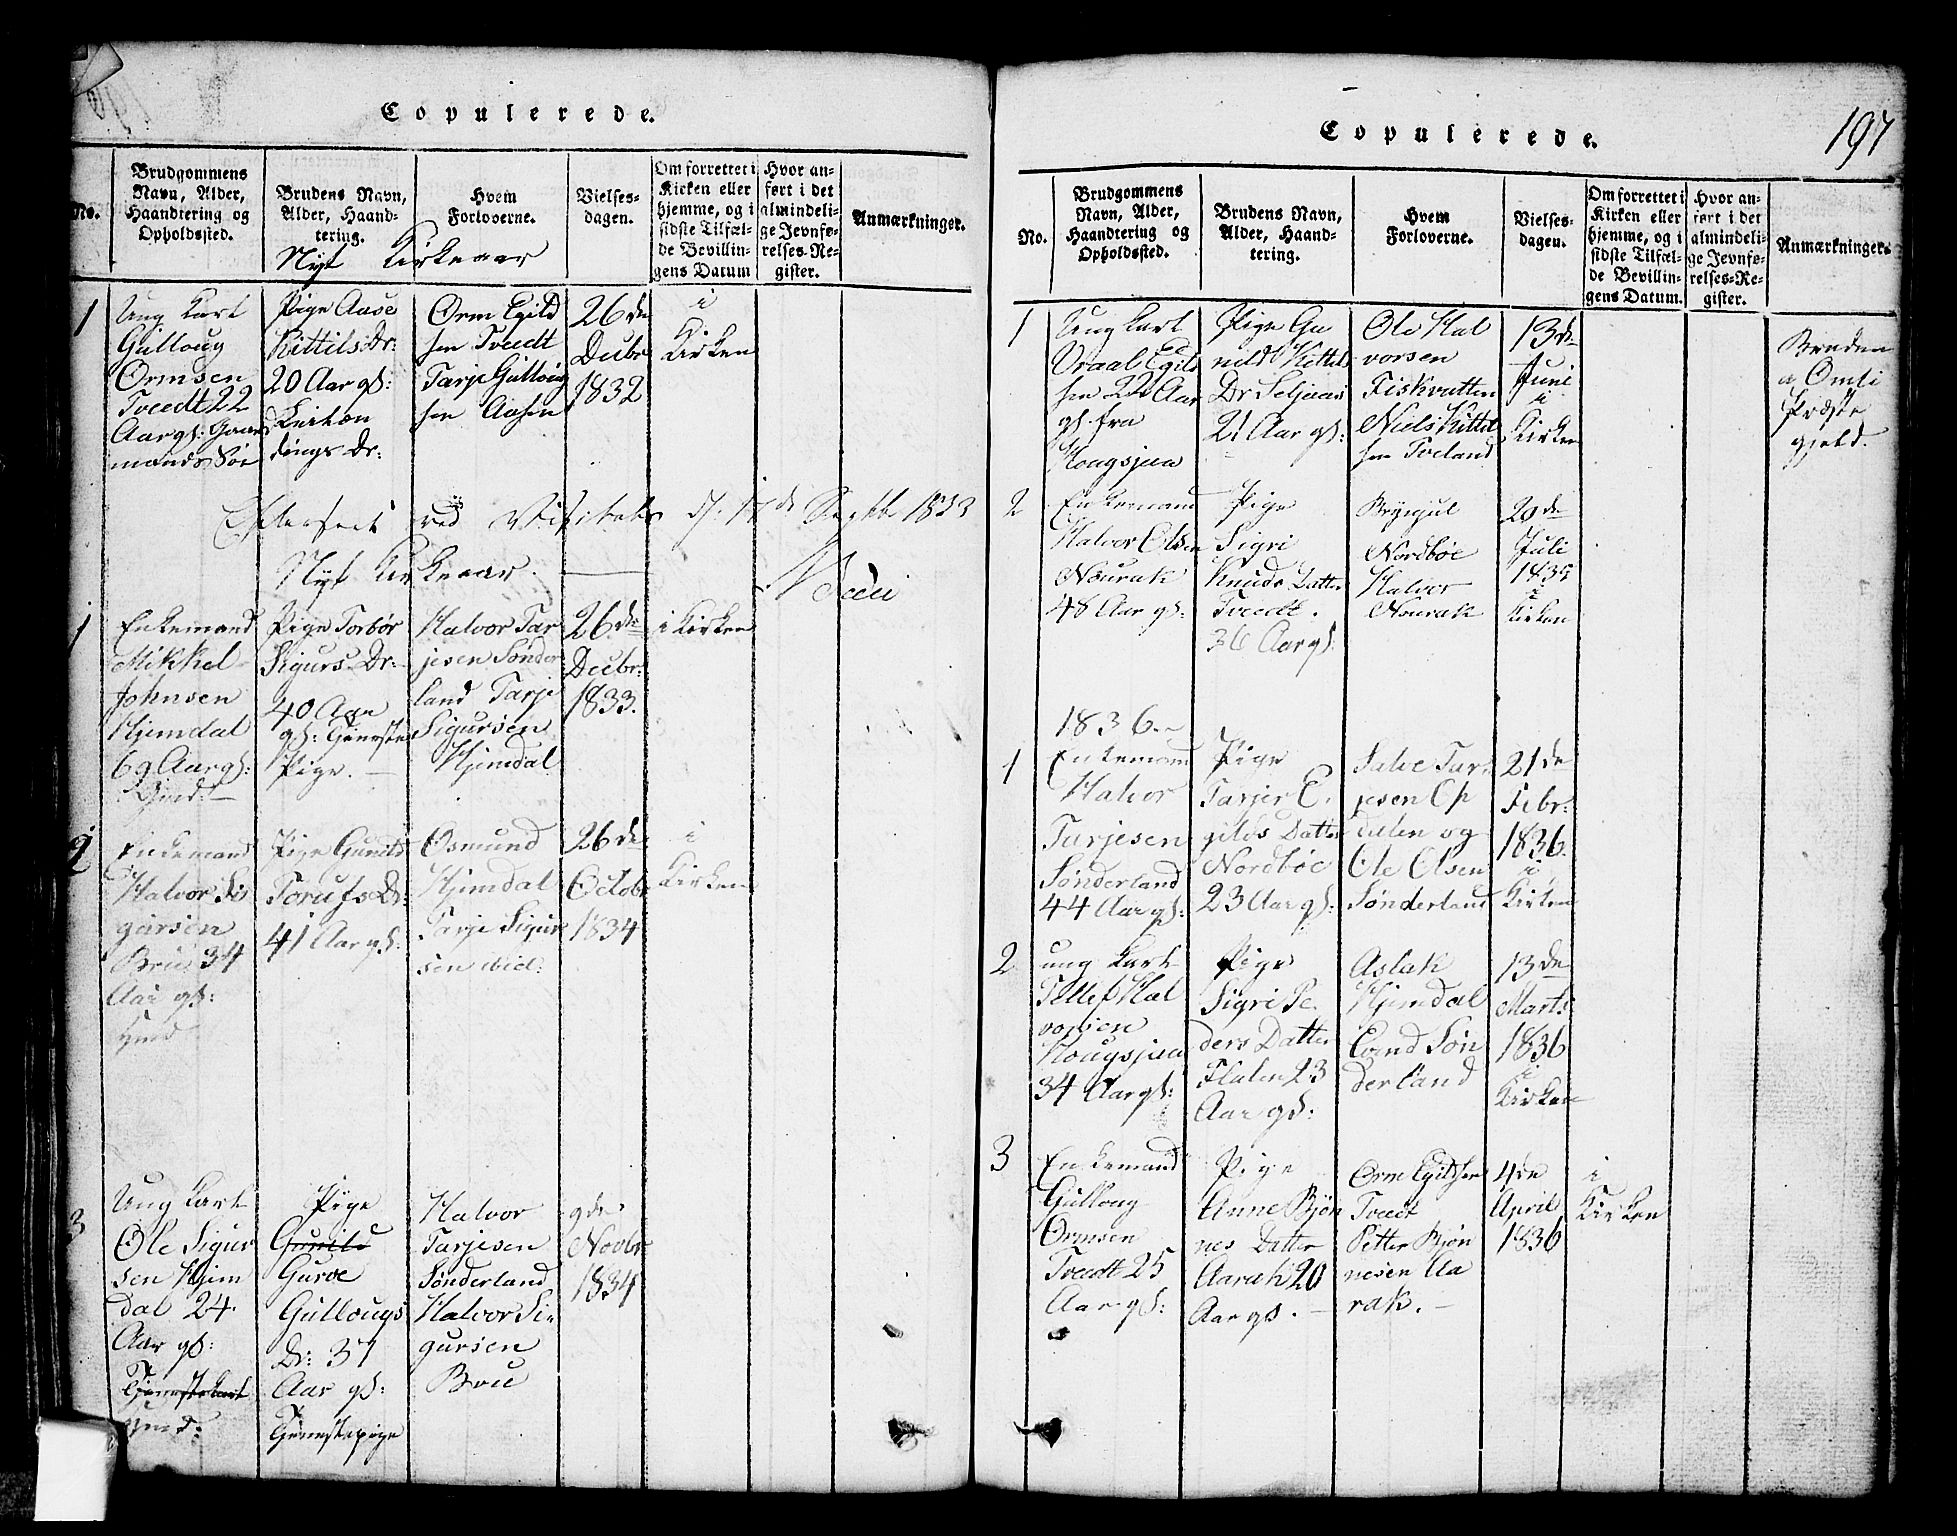 SAKO, Nissedal kirkebøker, G/Gb/L0001: Klokkerbok nr. II 1, 1814-1862, s. 197